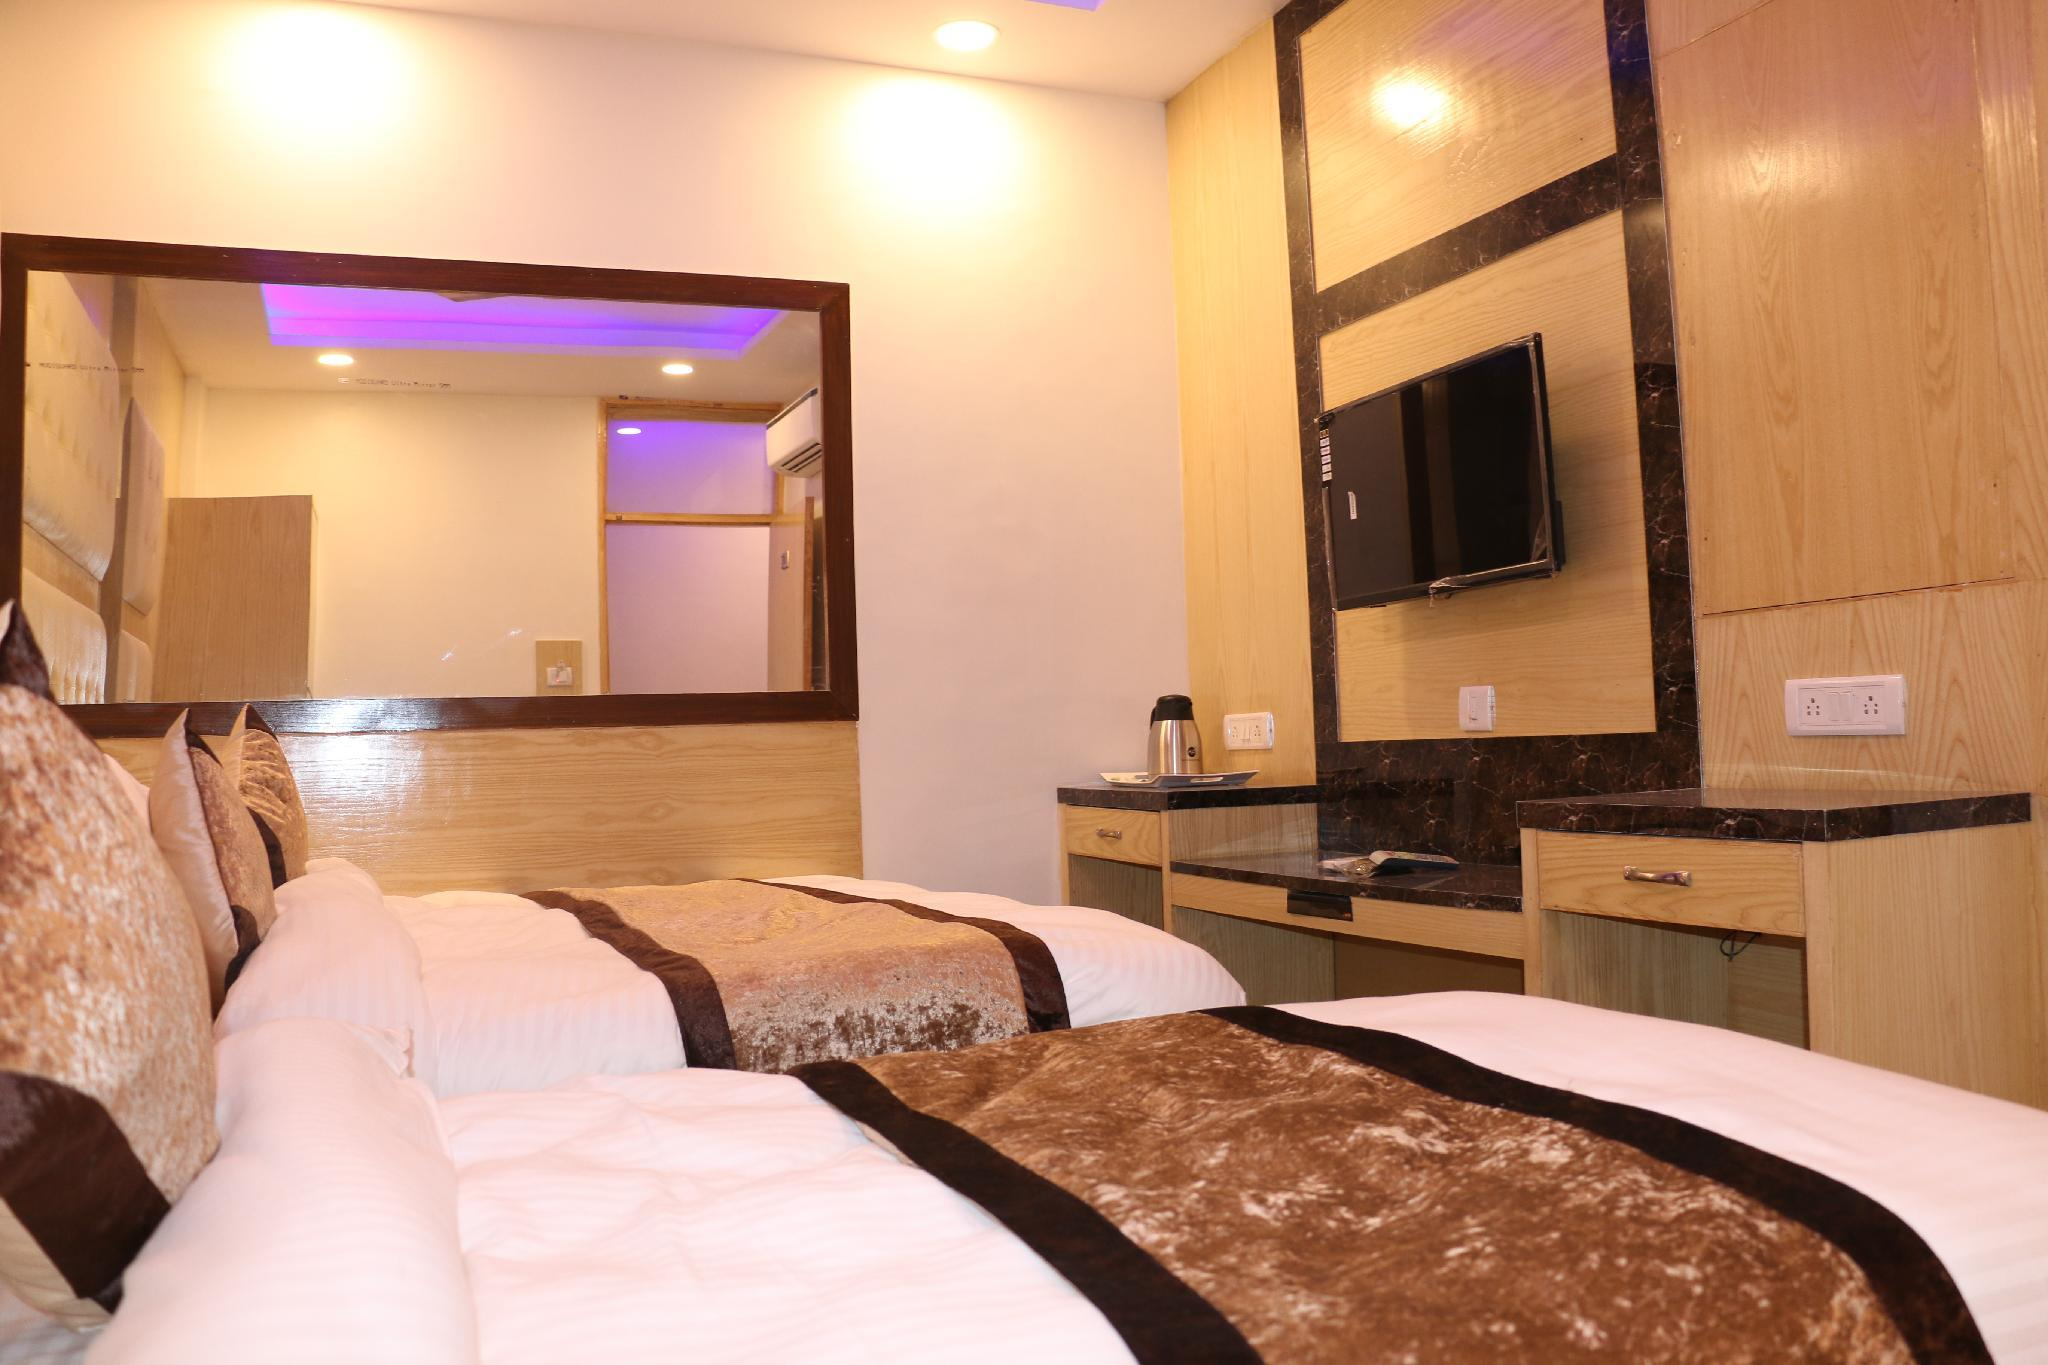 Prince Polonia Hotel